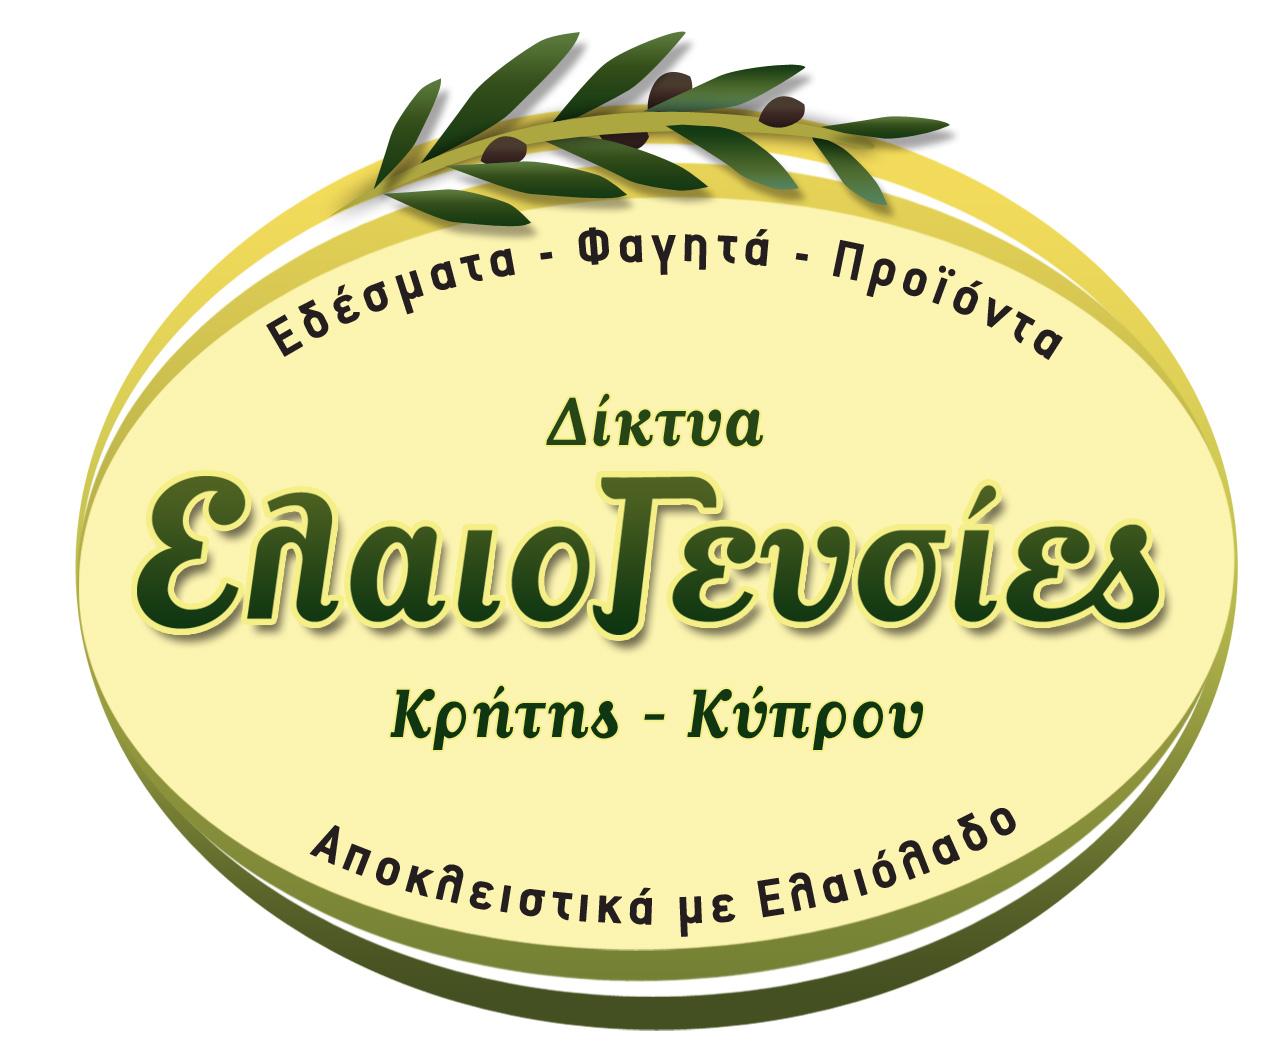 elaiogeusies-logo.jpg